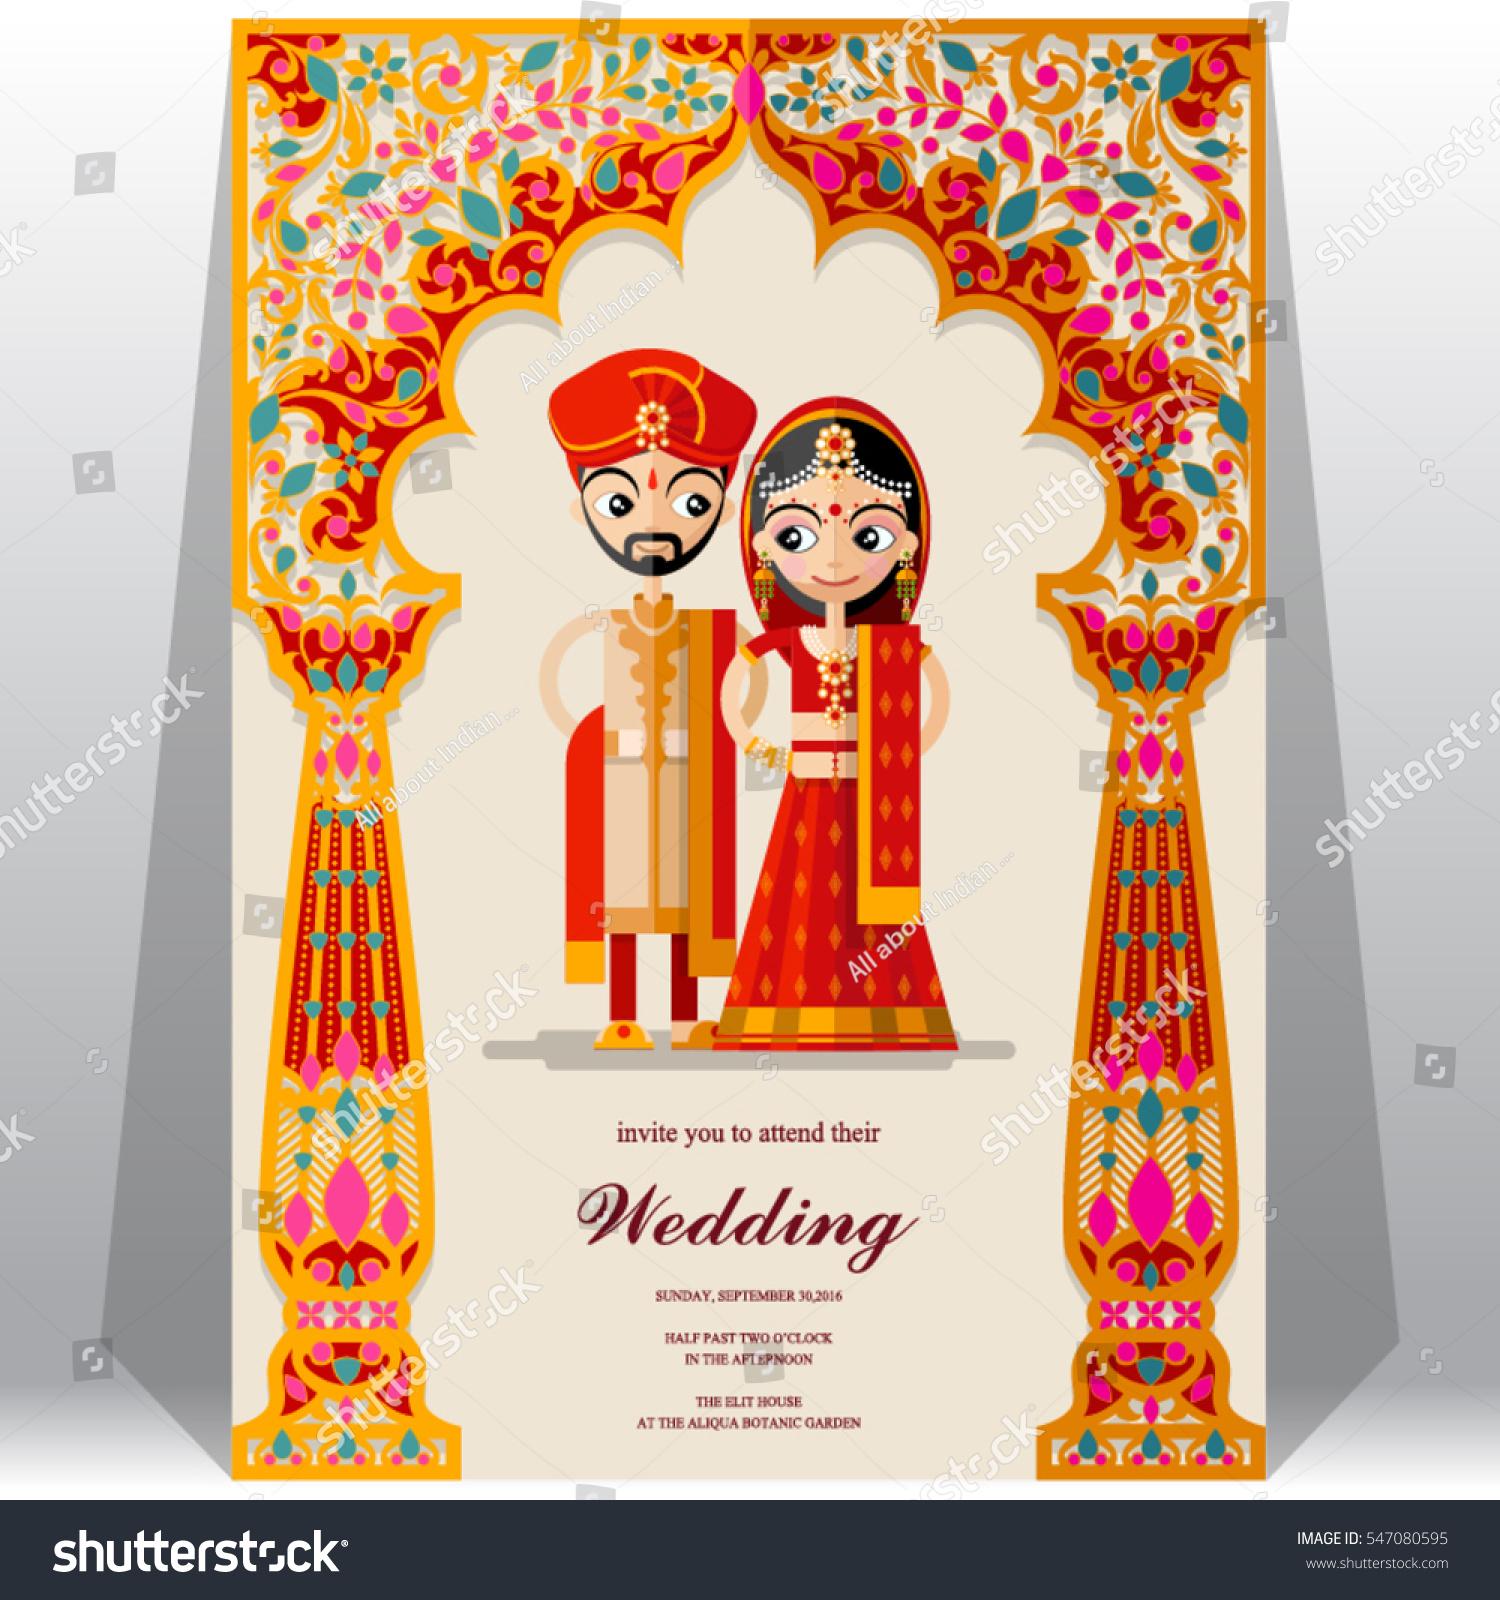 Royalty-free Indian wedding invitation card. #547080595 Stock Photo ...